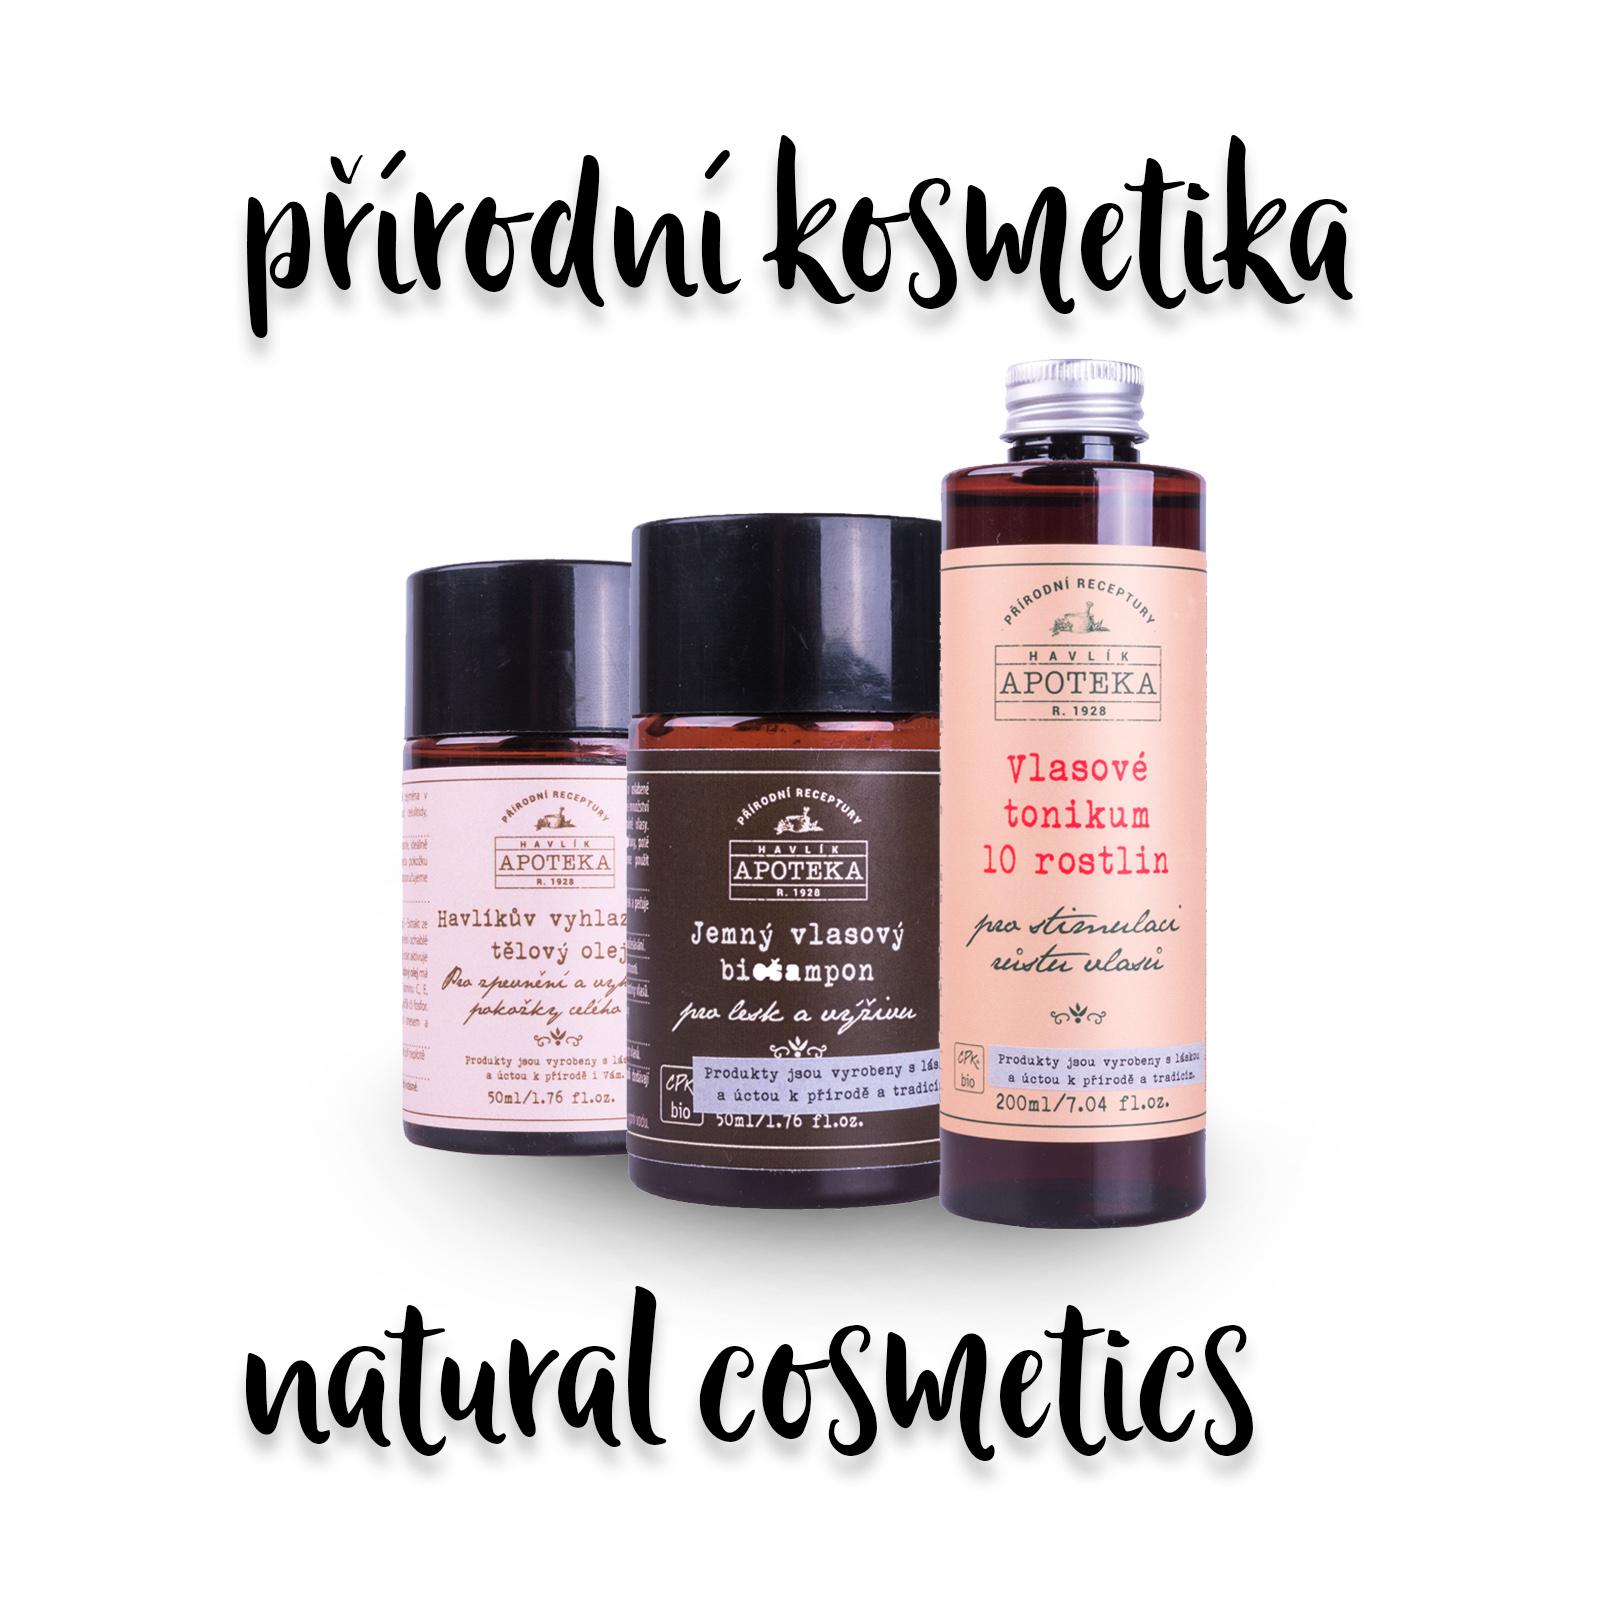 Kosmetika a péče o miminko (Natural cosmetics)